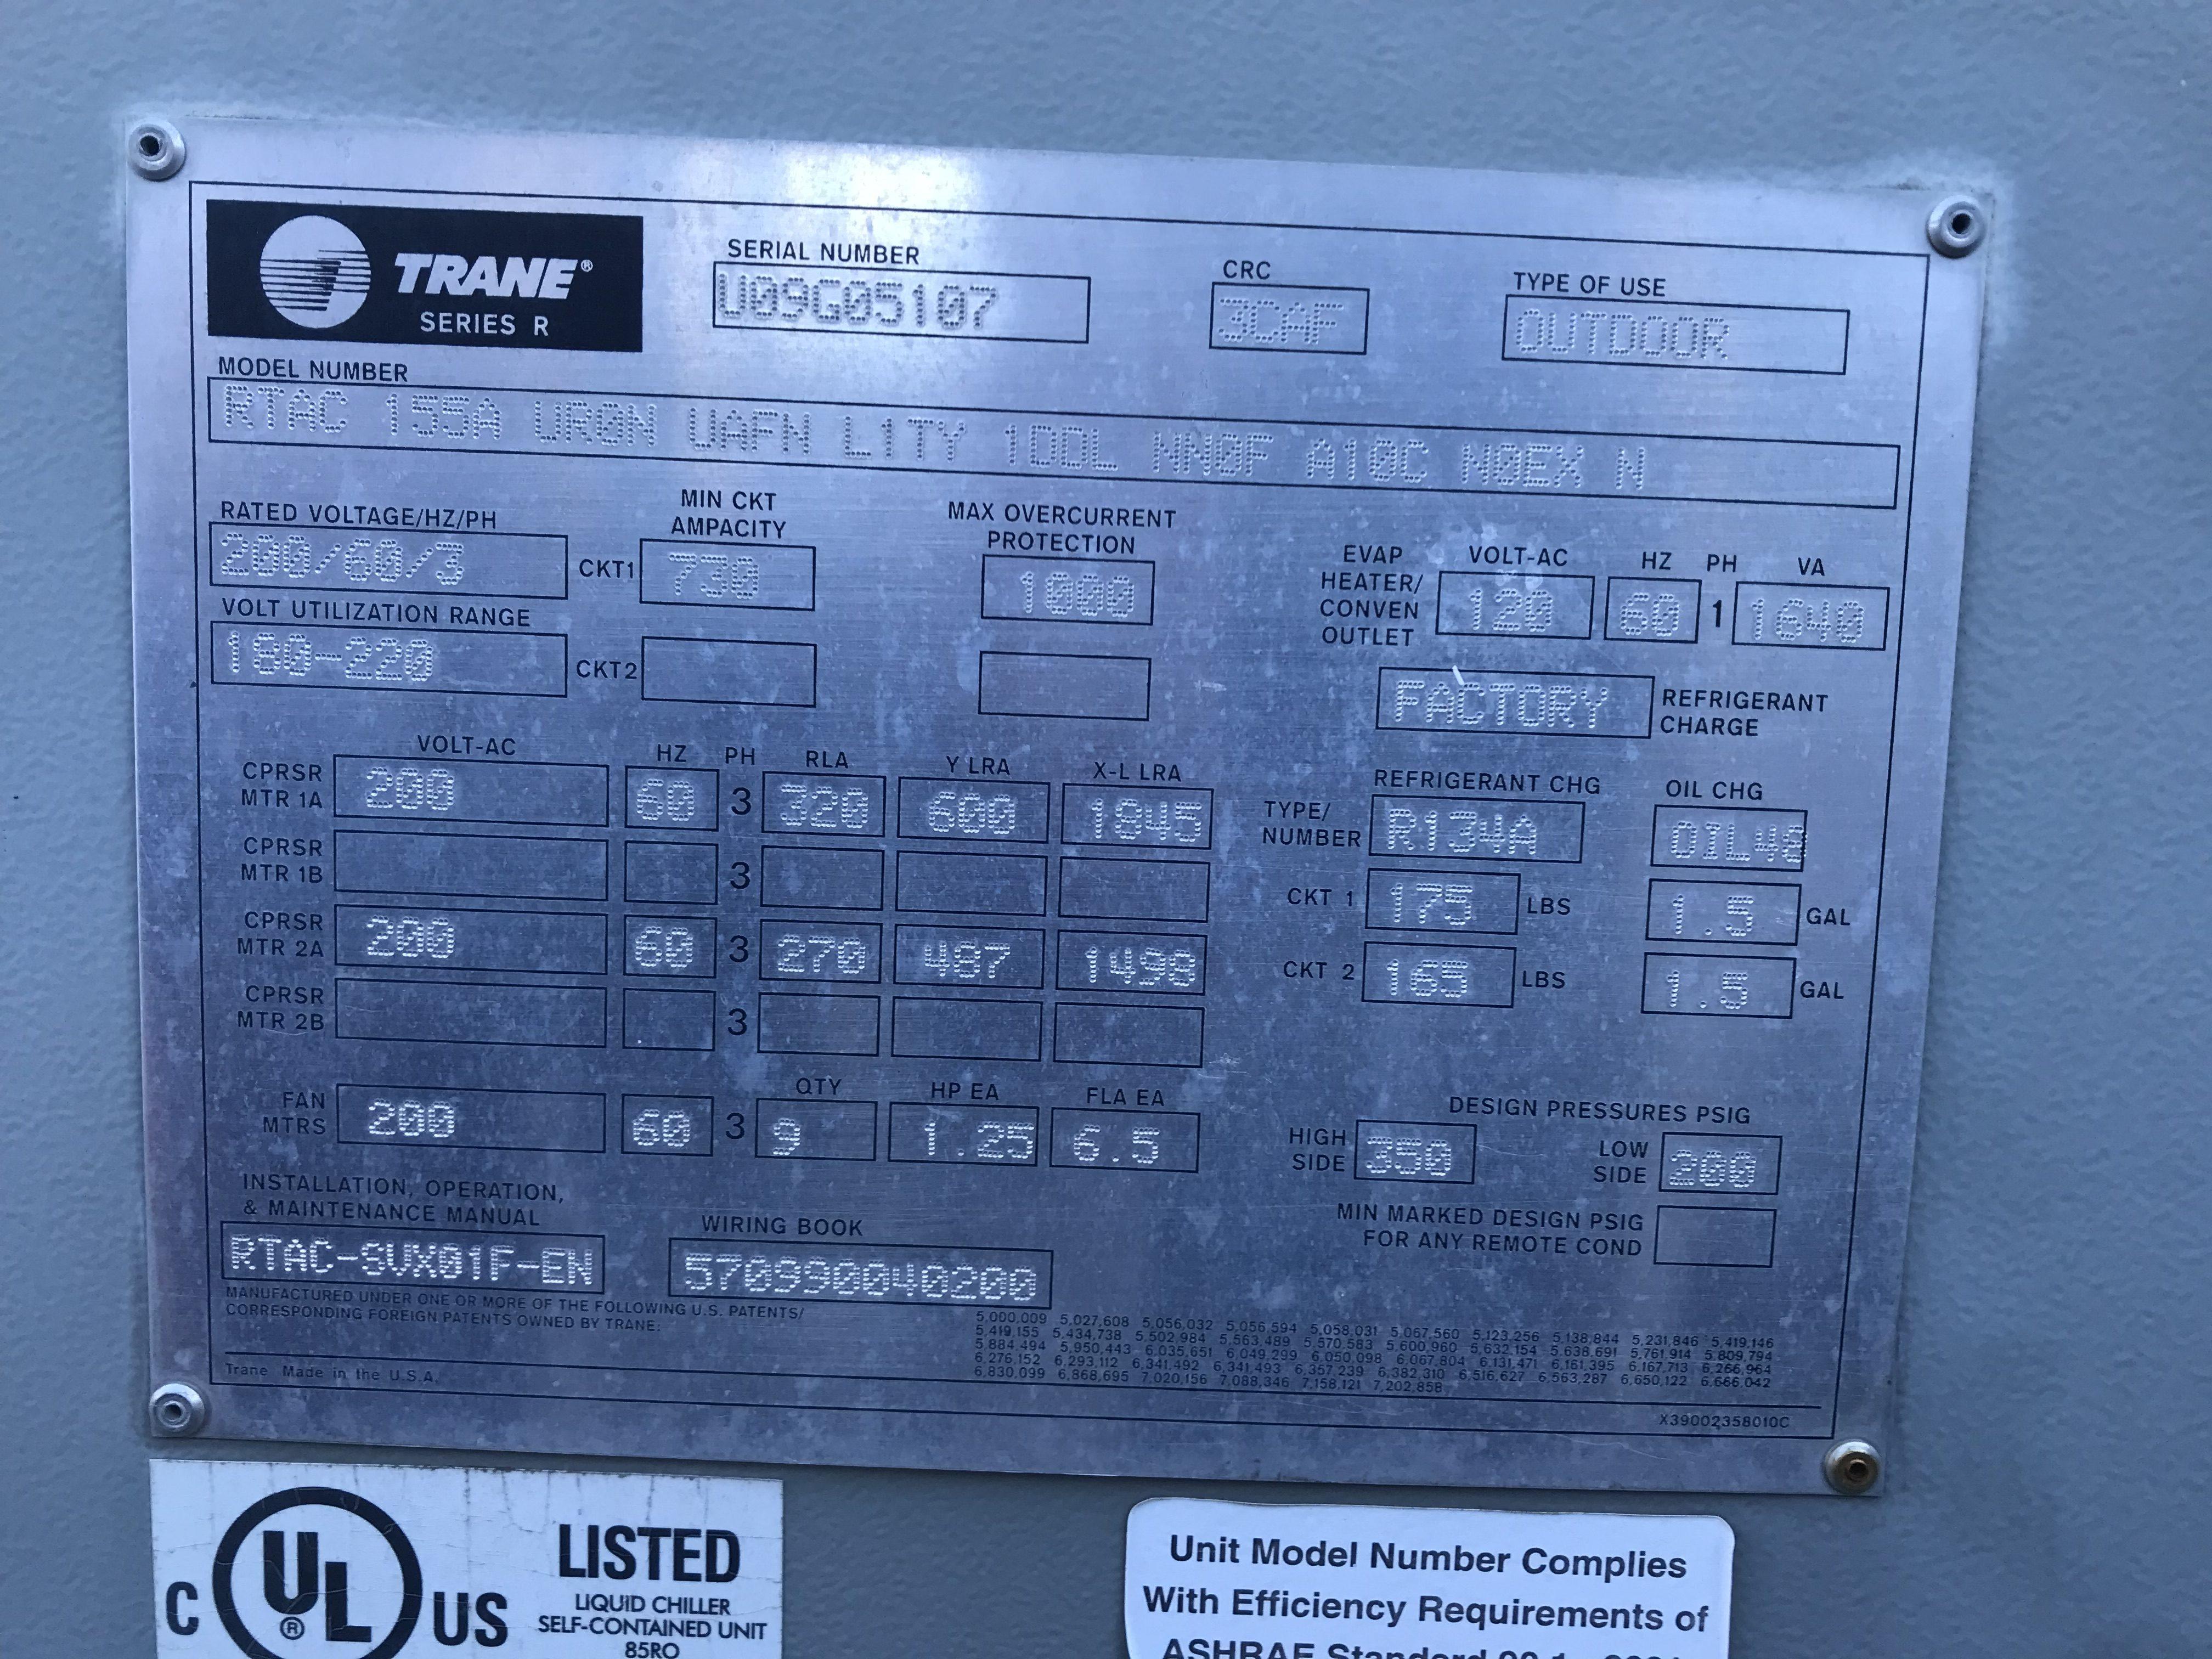 Trane rtac Chiller Parts Manual